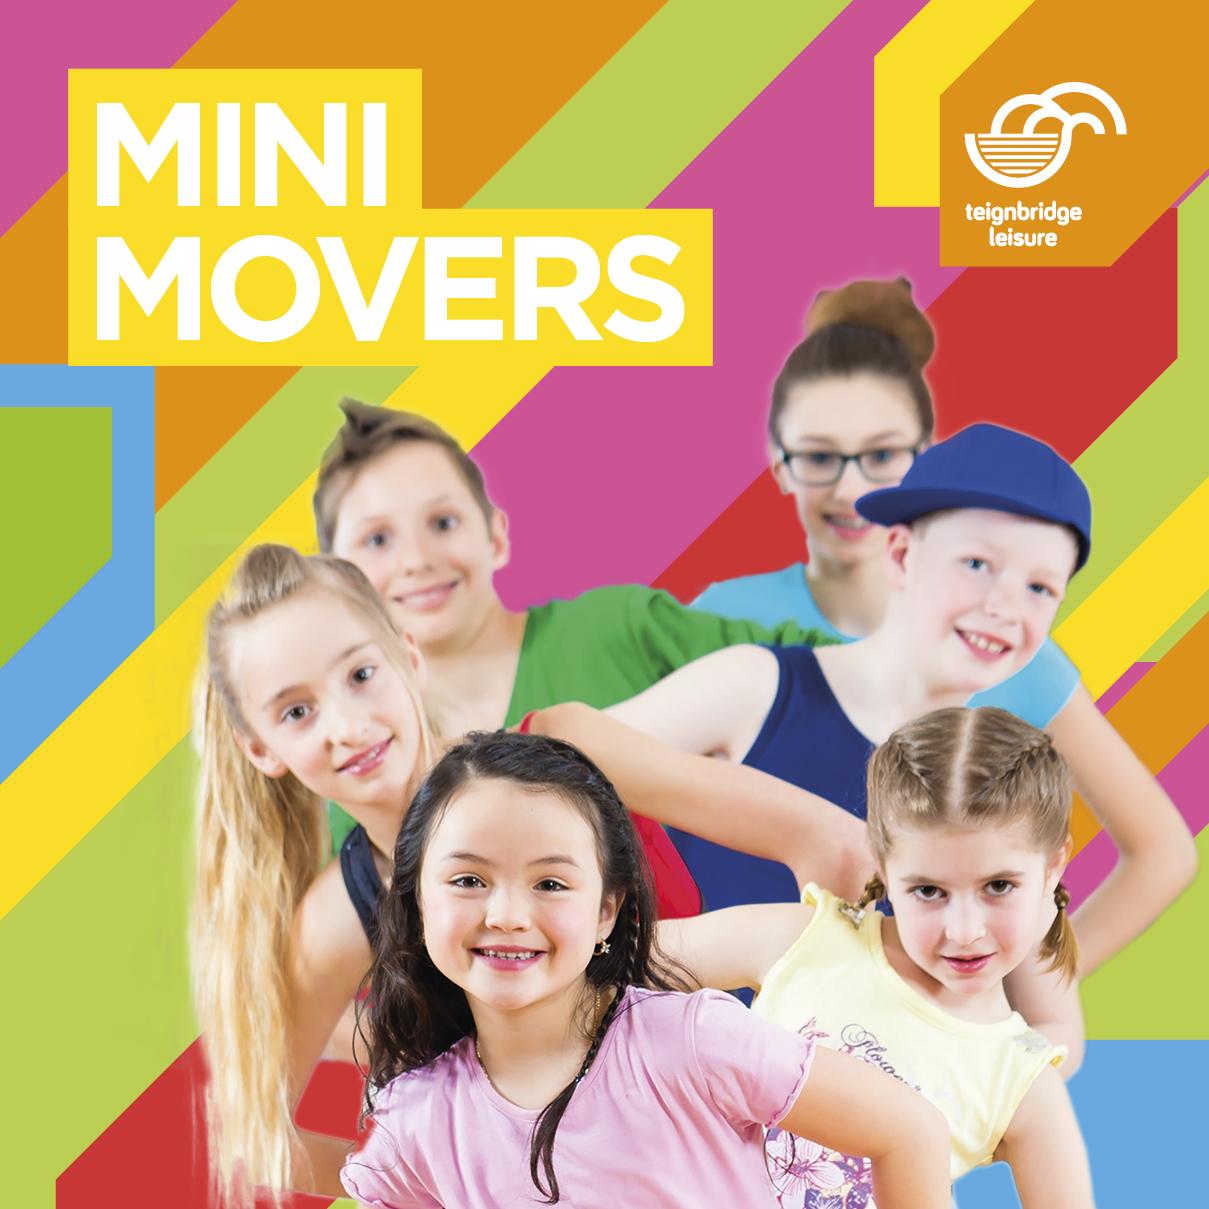 87090_MiniMovers